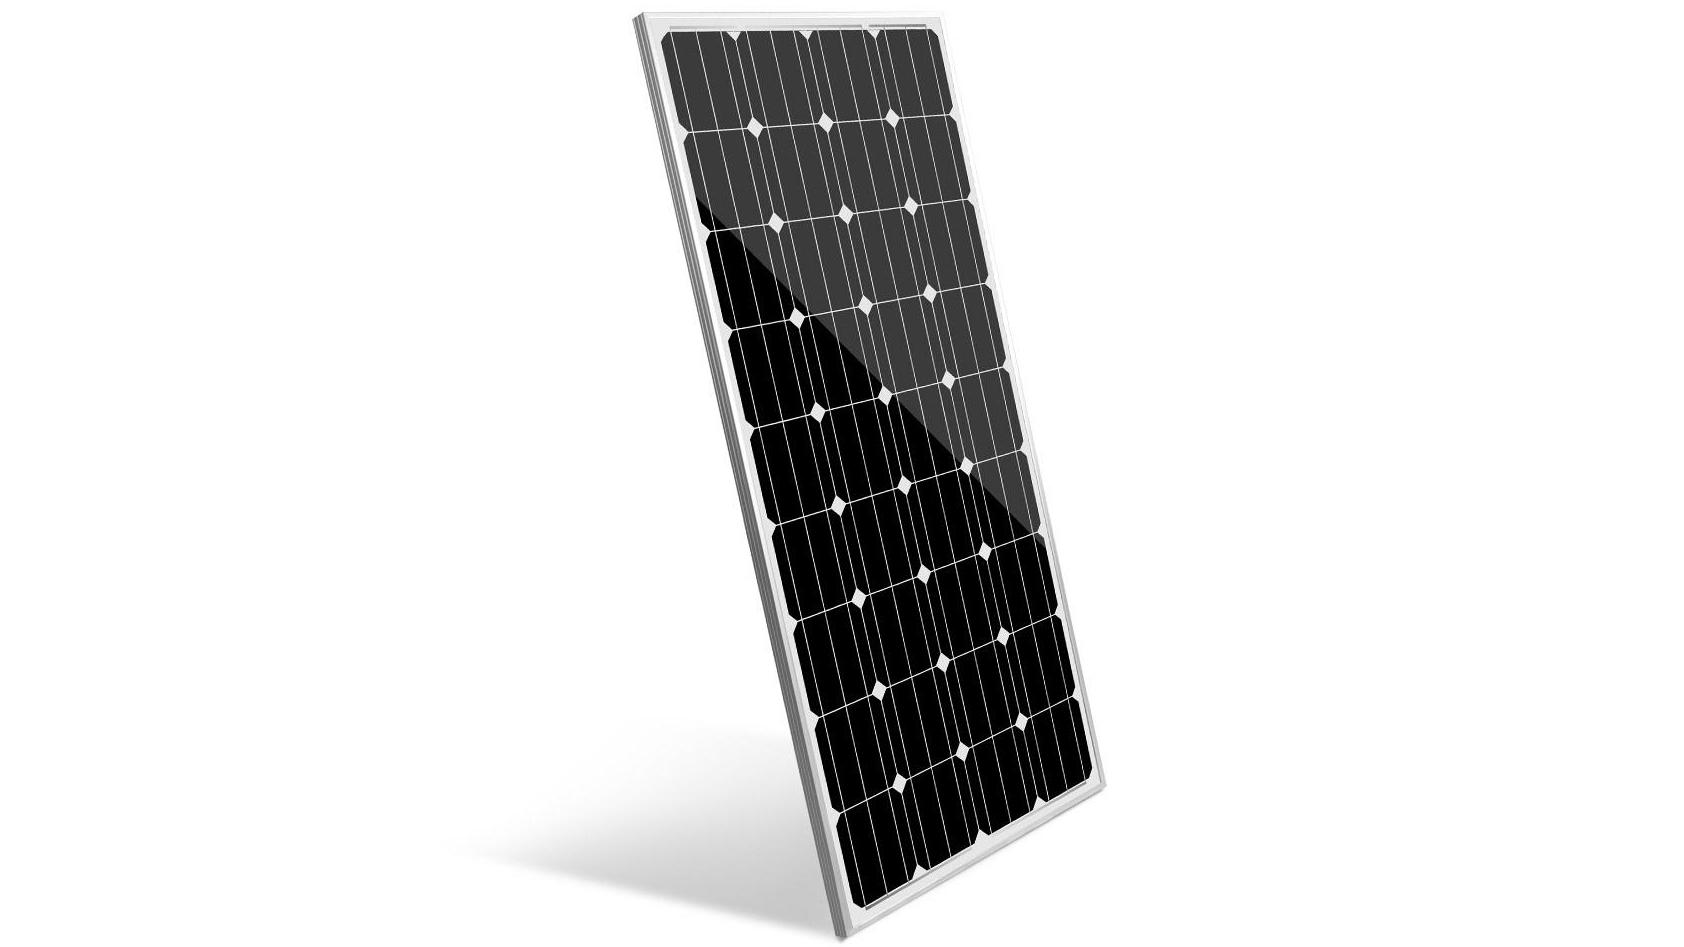 Buy Solraiser 12v 250w Flat Single Solar Panel Kit Harvey Norman Au